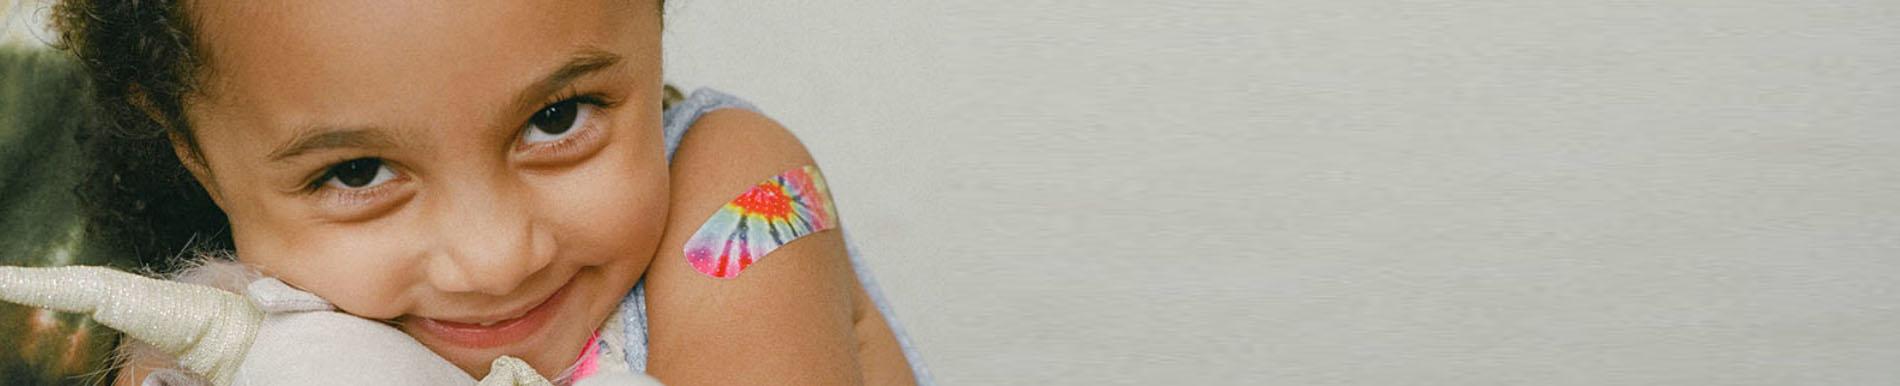 https://www.healthychildren.org/SiteCollectionImage-Homepage-Banners/Flu_Shot_Homepage.jpg